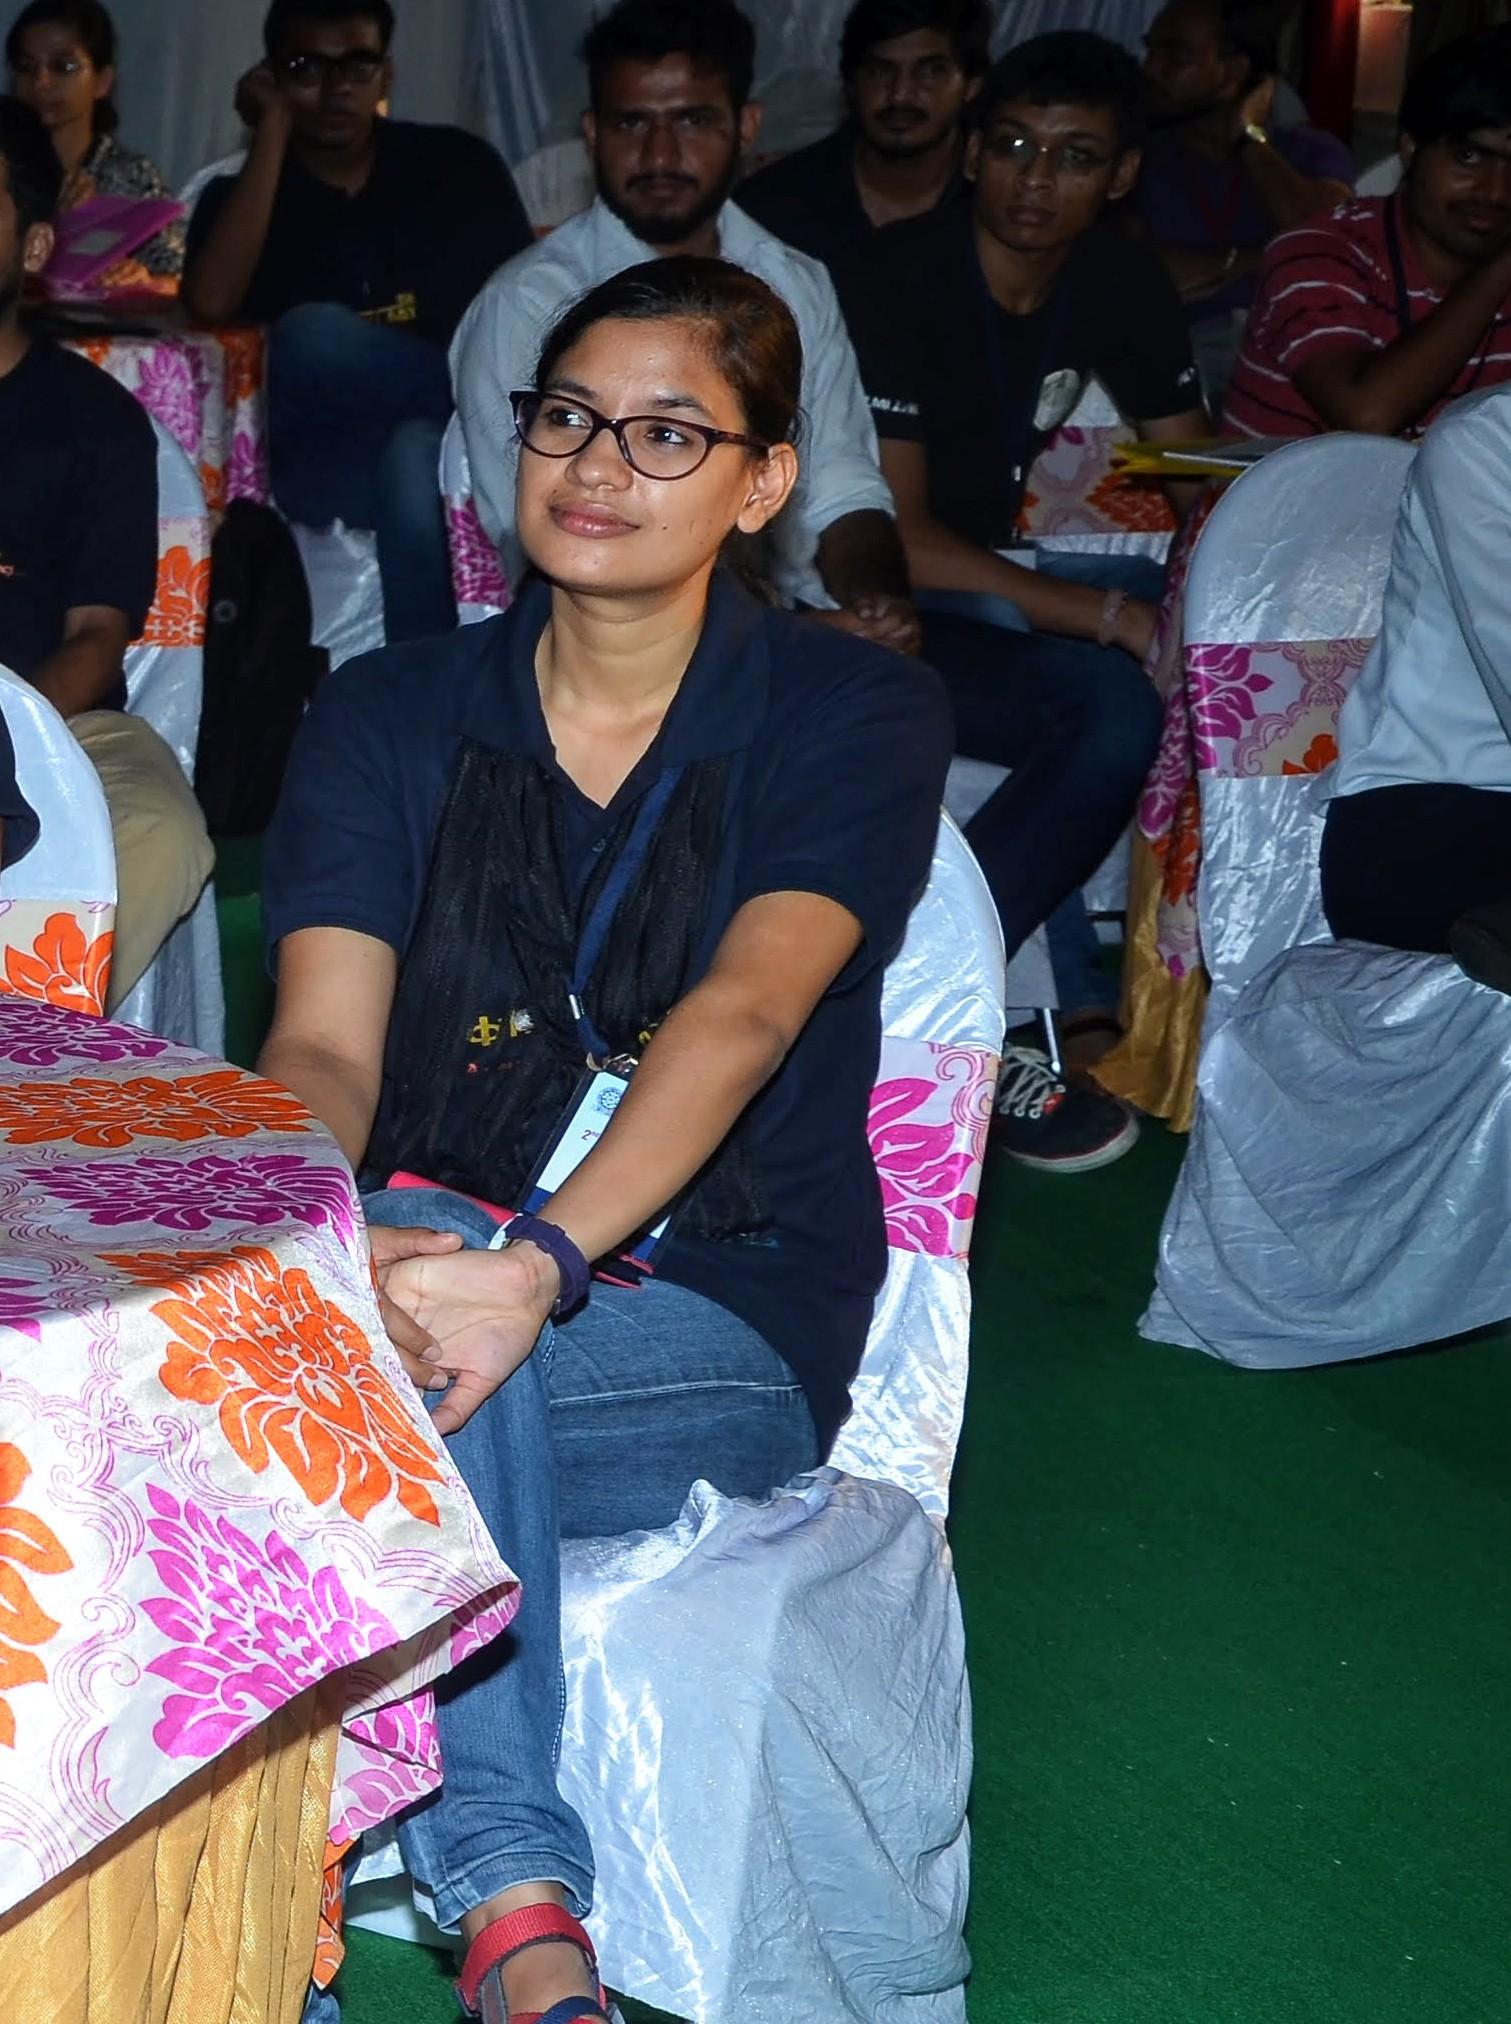 Ms. Deepa Lohani